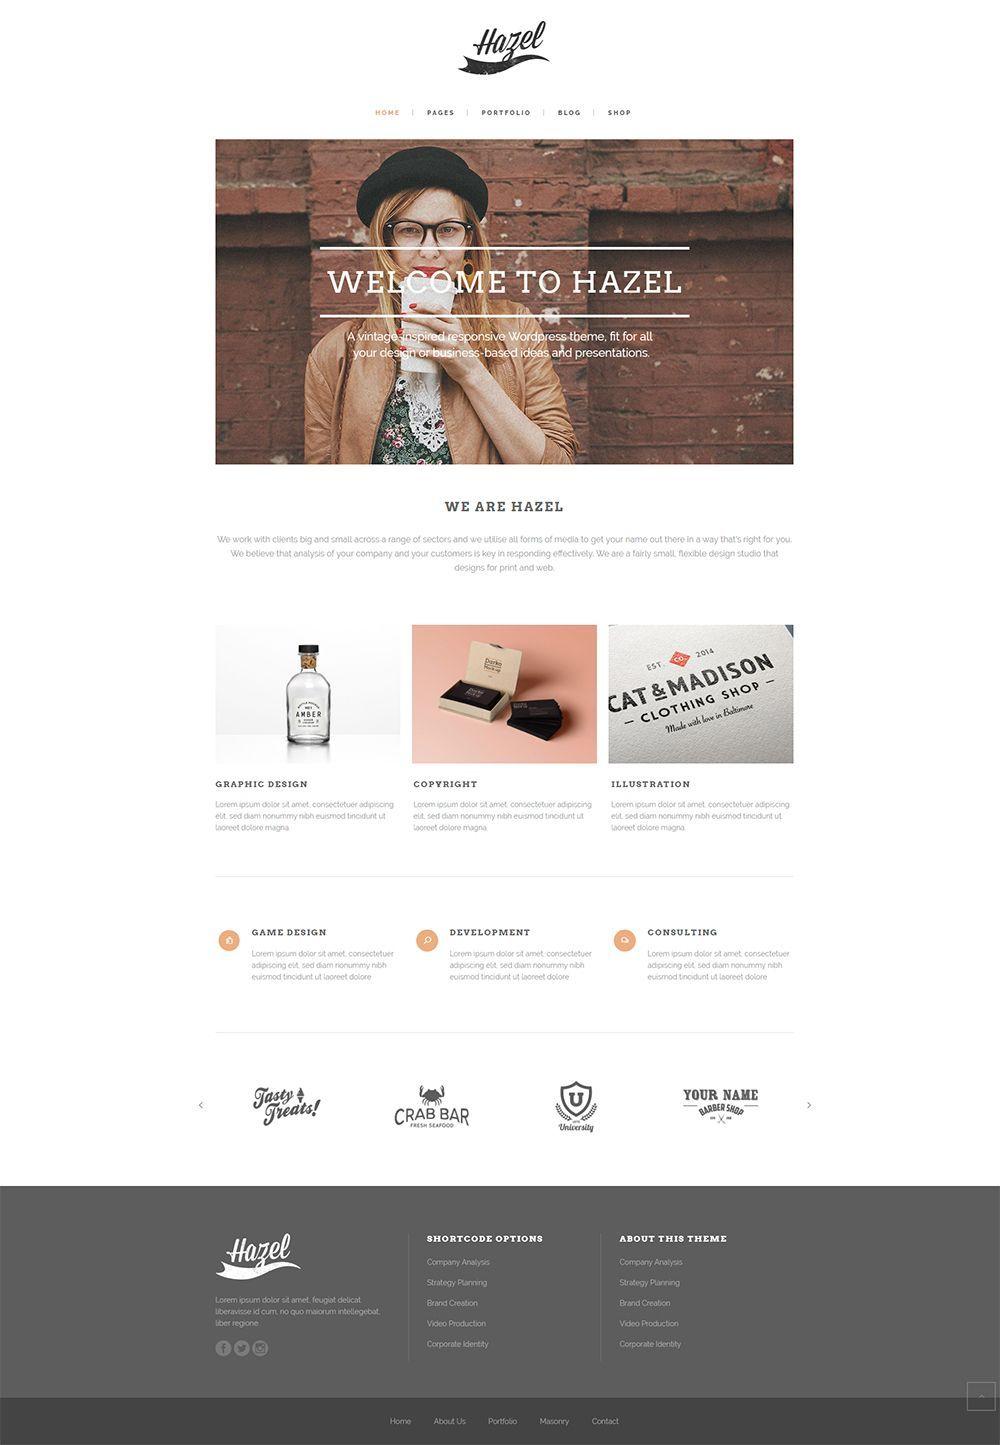 Create your dream website today with Hazel WordPress theme